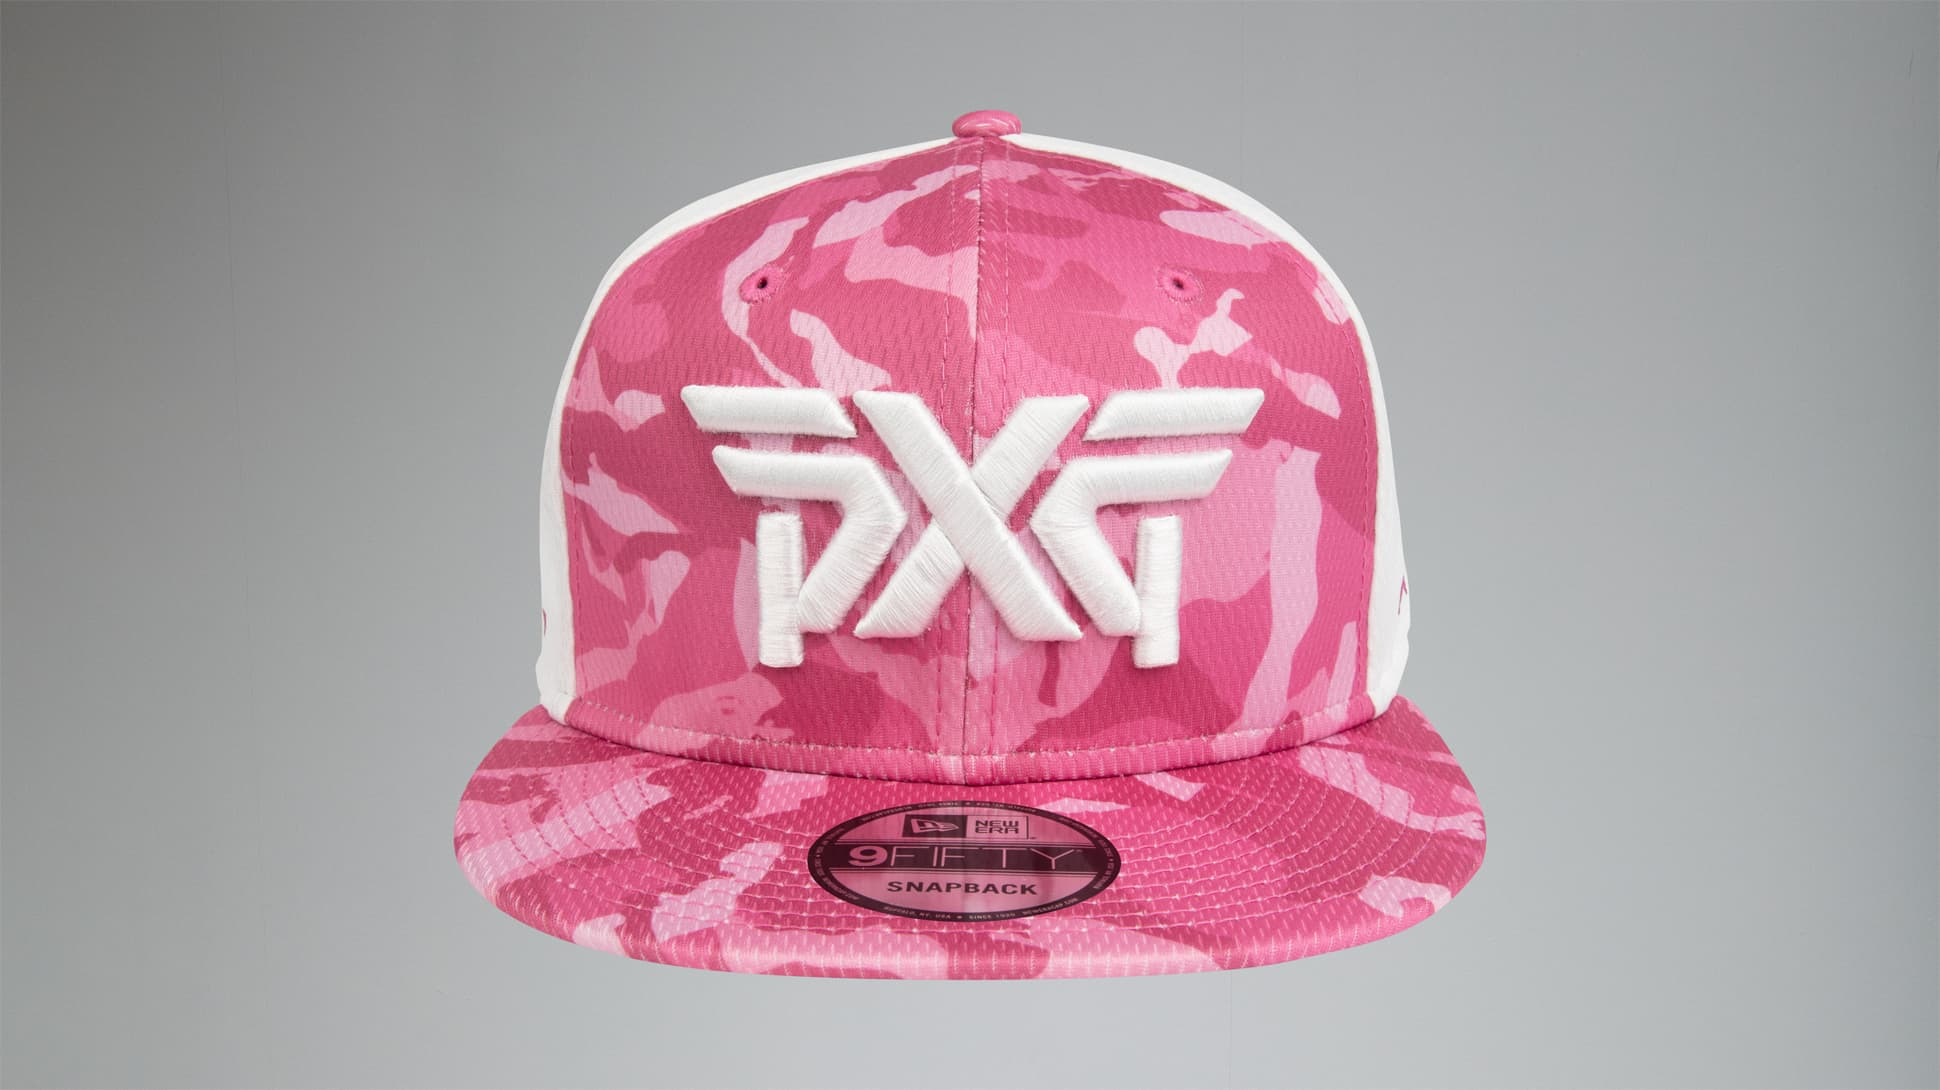 Fairway Camo™ Pink 9FIFTY Snapback Cap Image 2